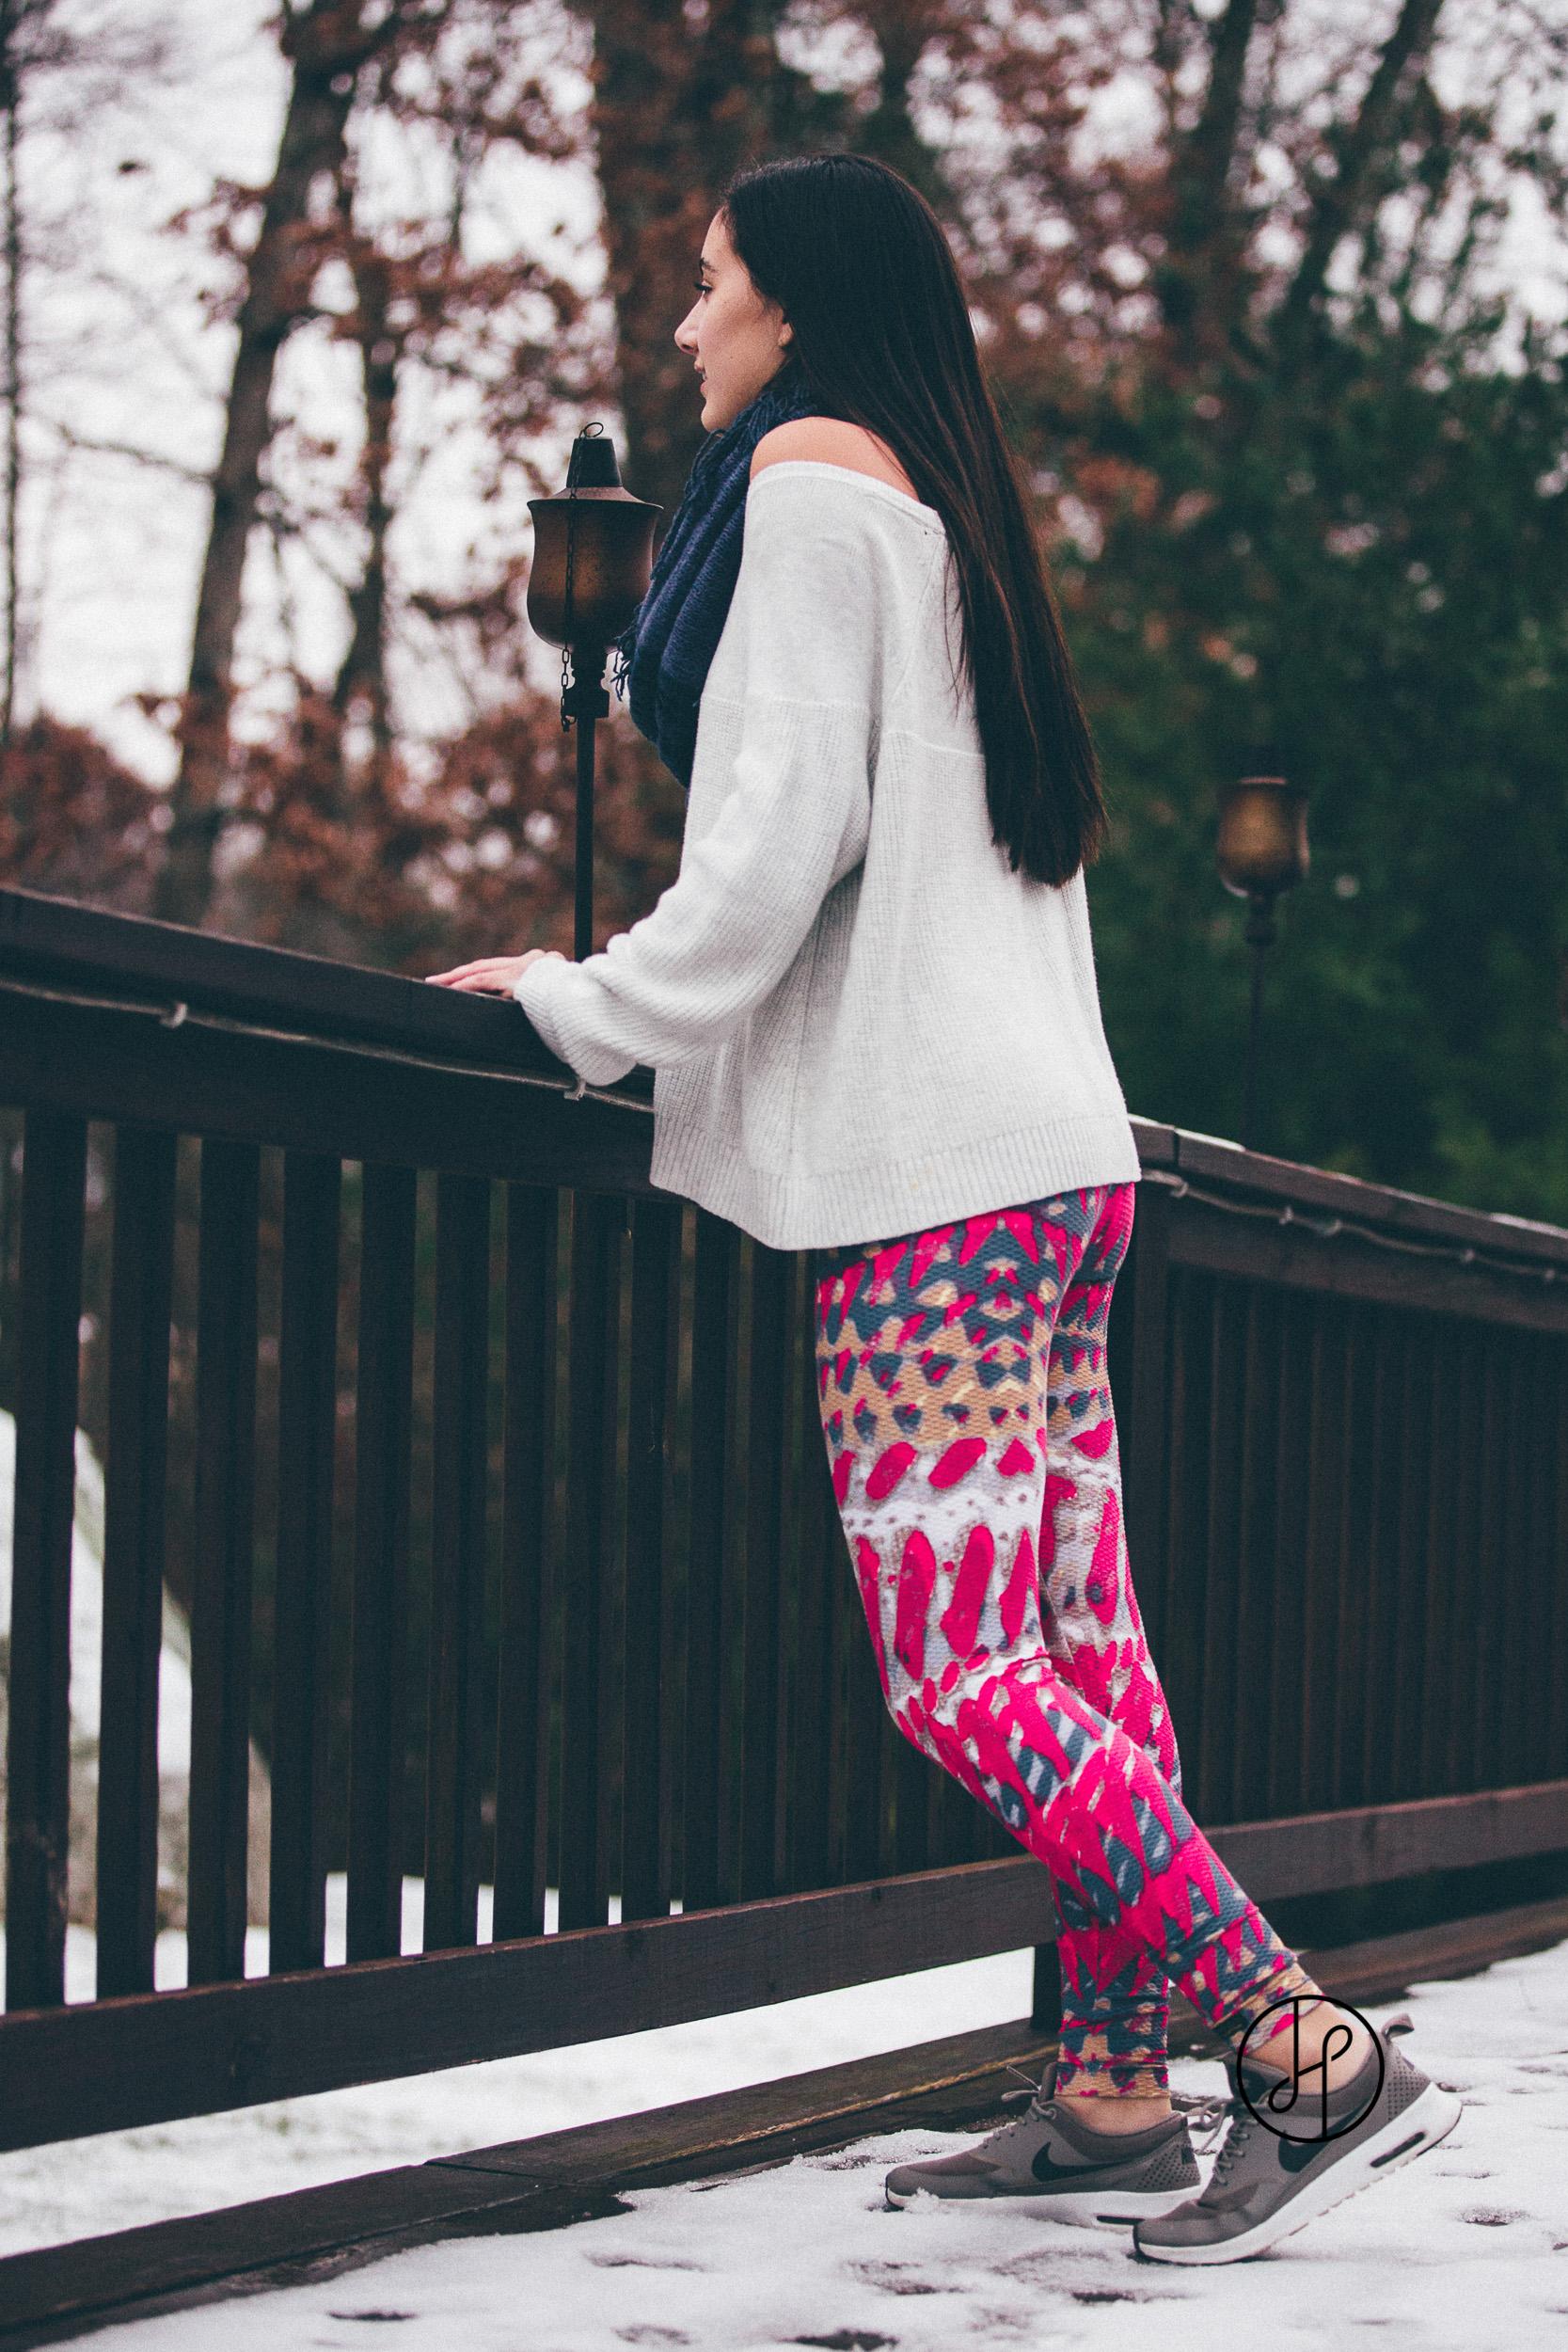 Pitanga_Winter_Fitness_Leggings_Jennifer_Helmka-2.jpg